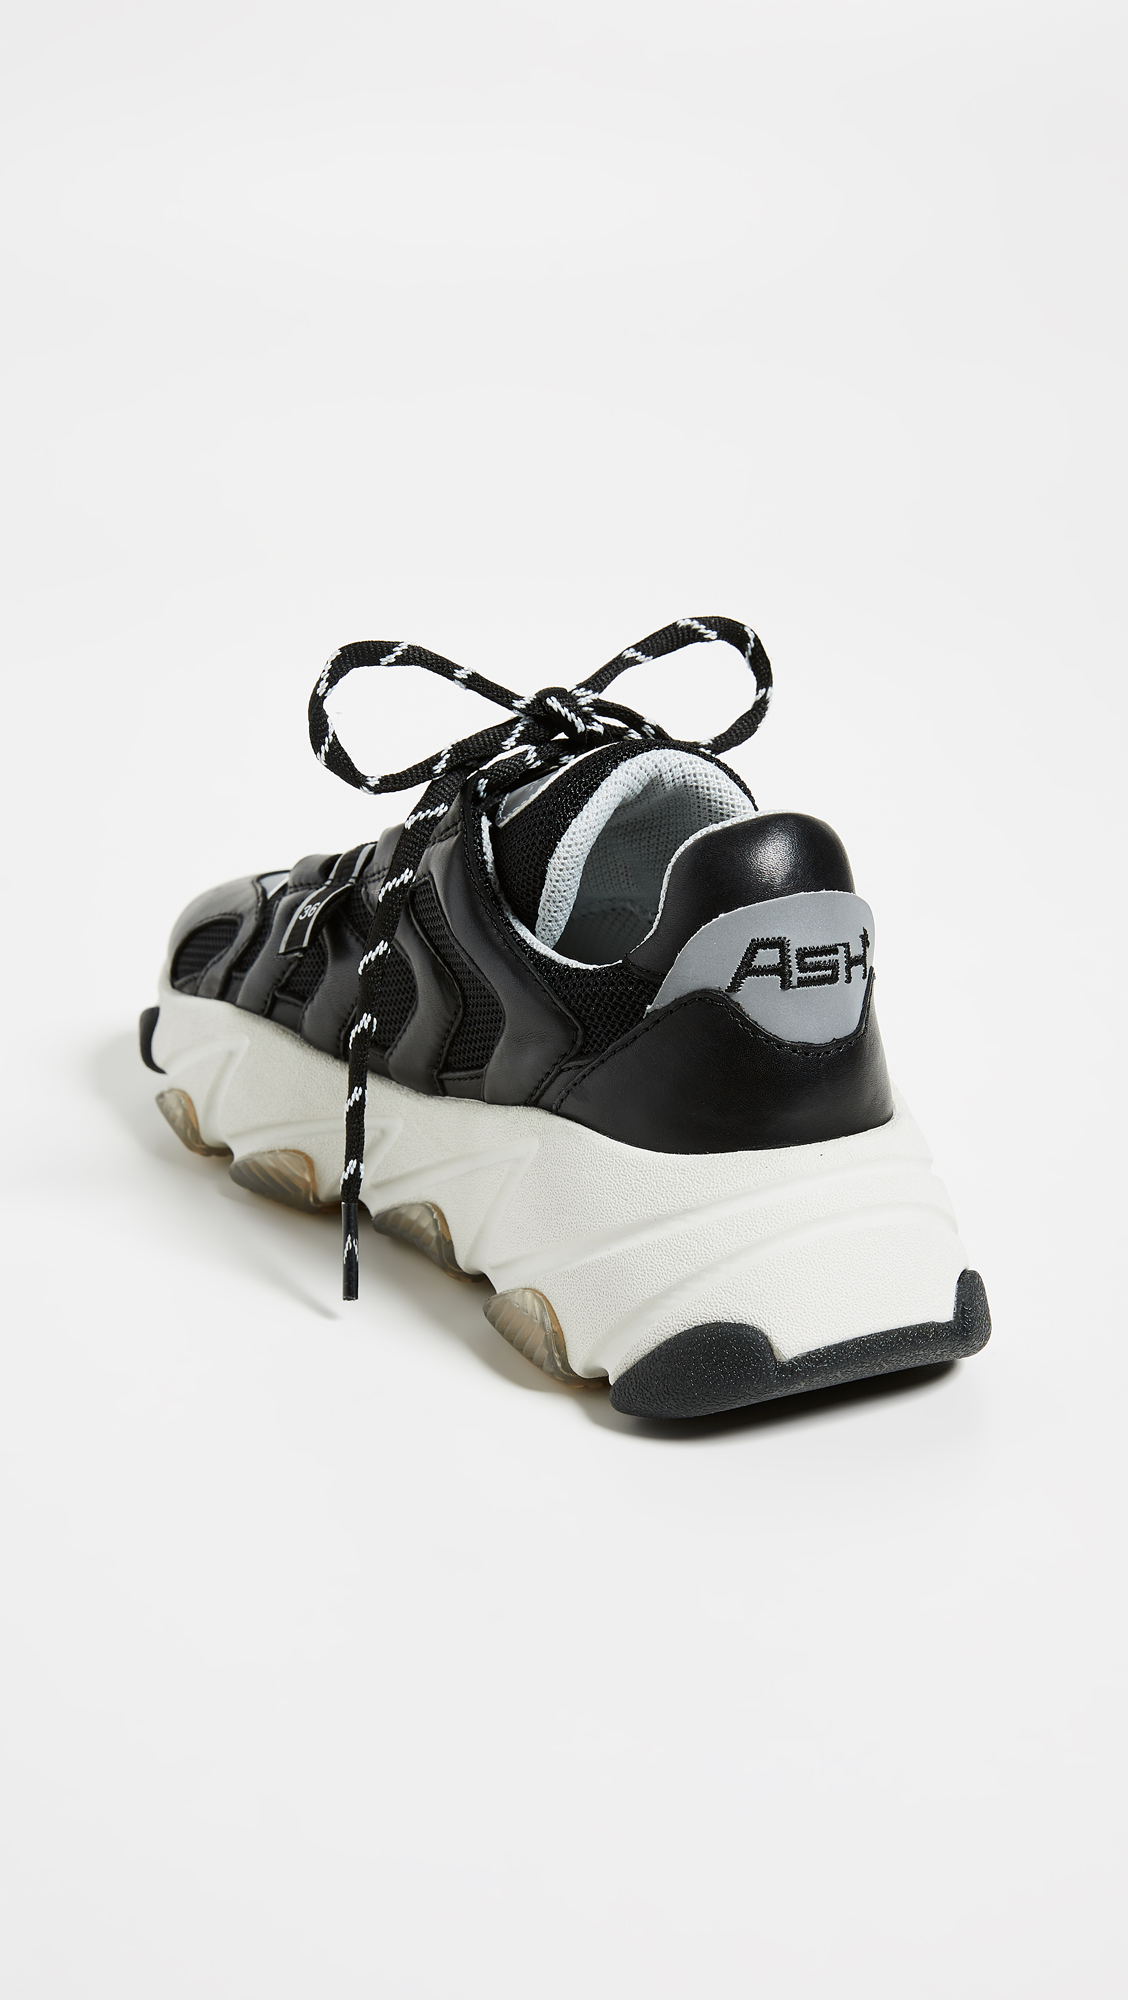 2d04eeb2e9da Ash Extreme Sneakers